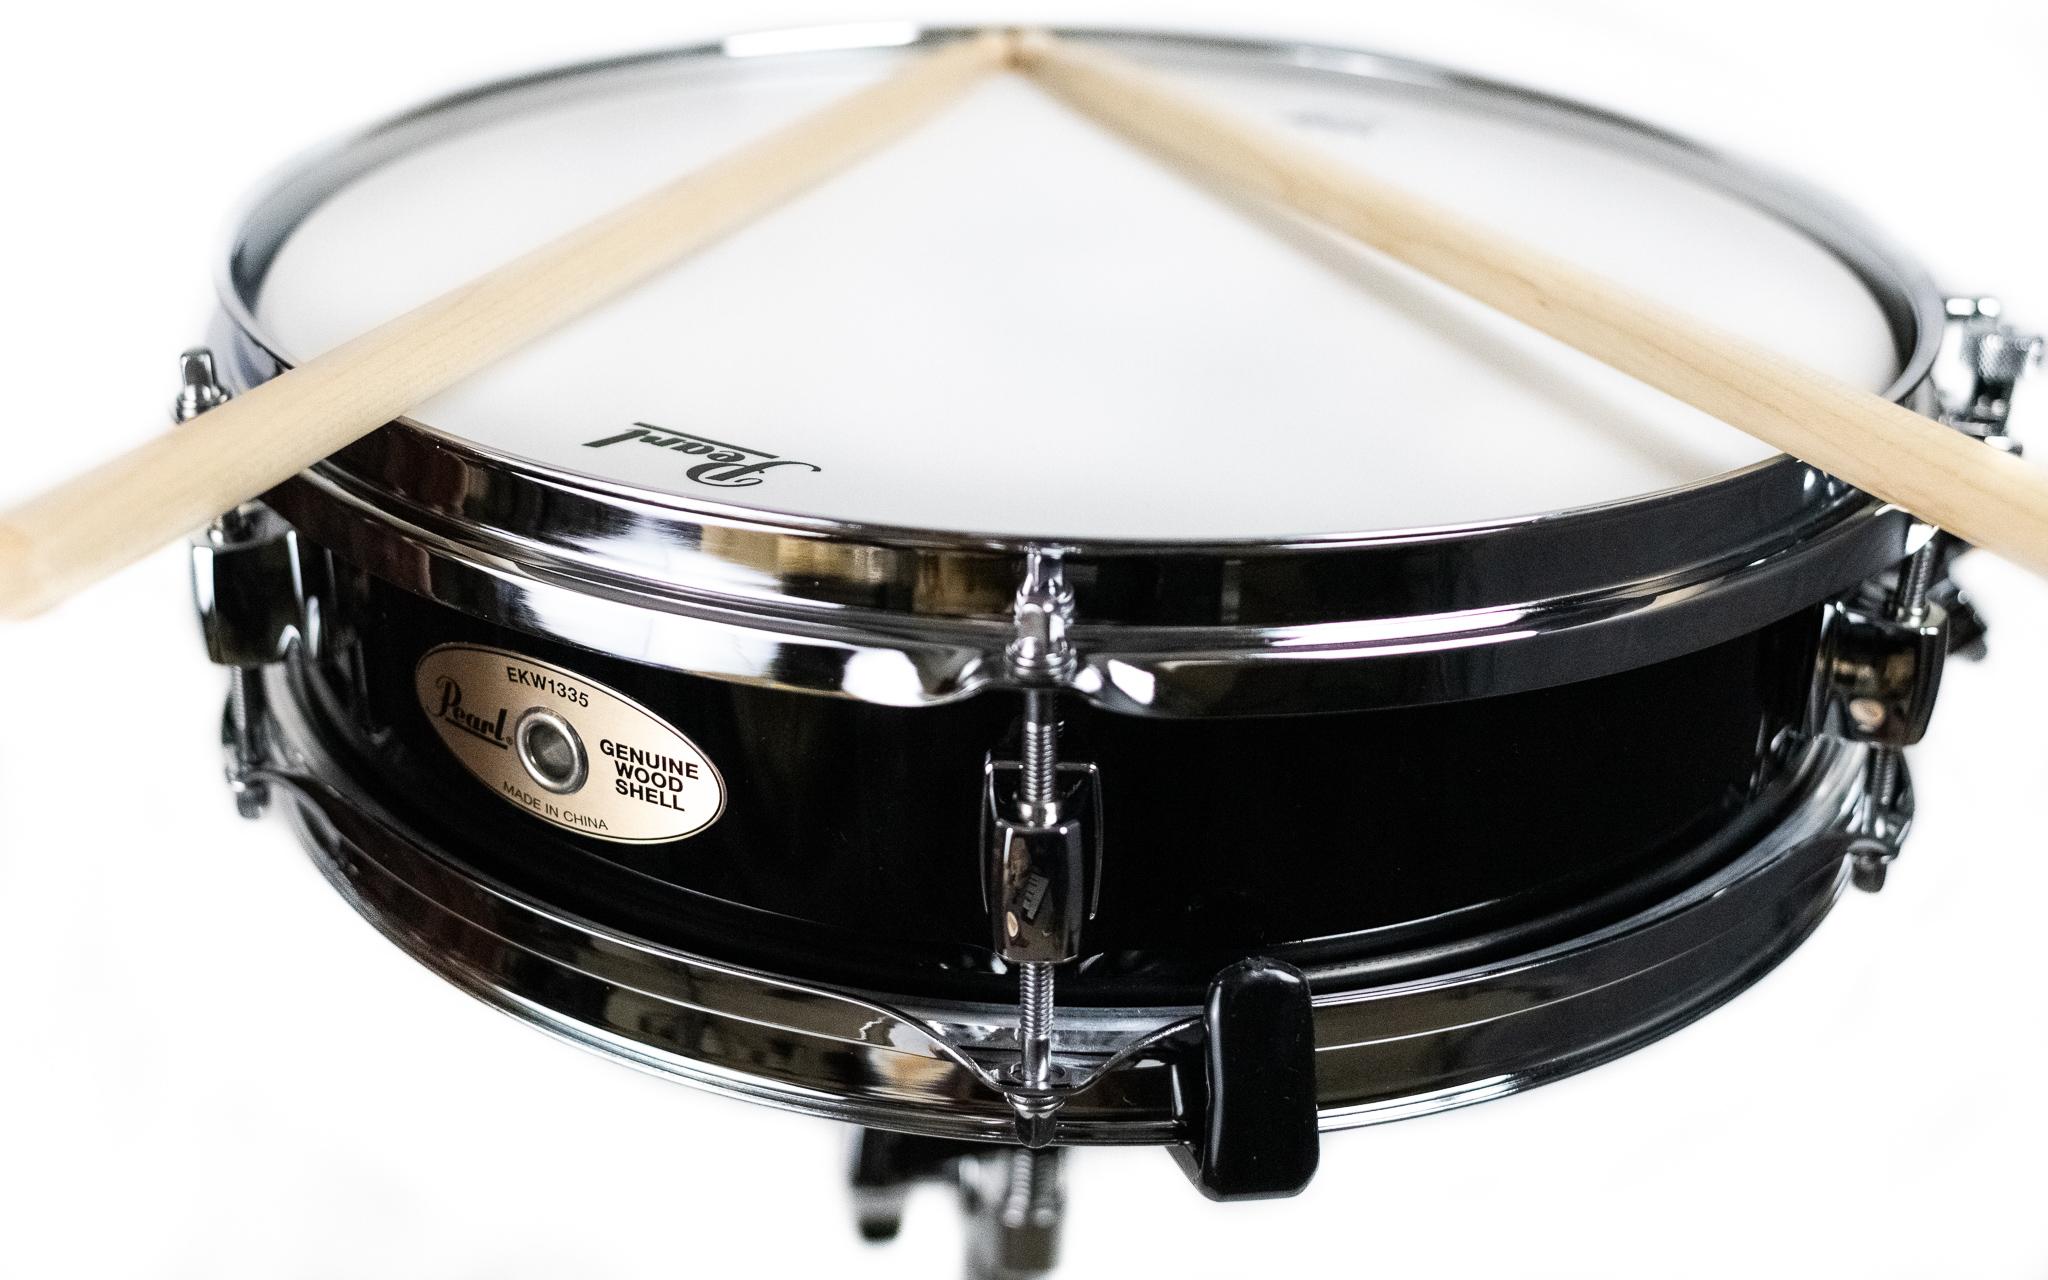 Drum kit rental in Memphis, TN